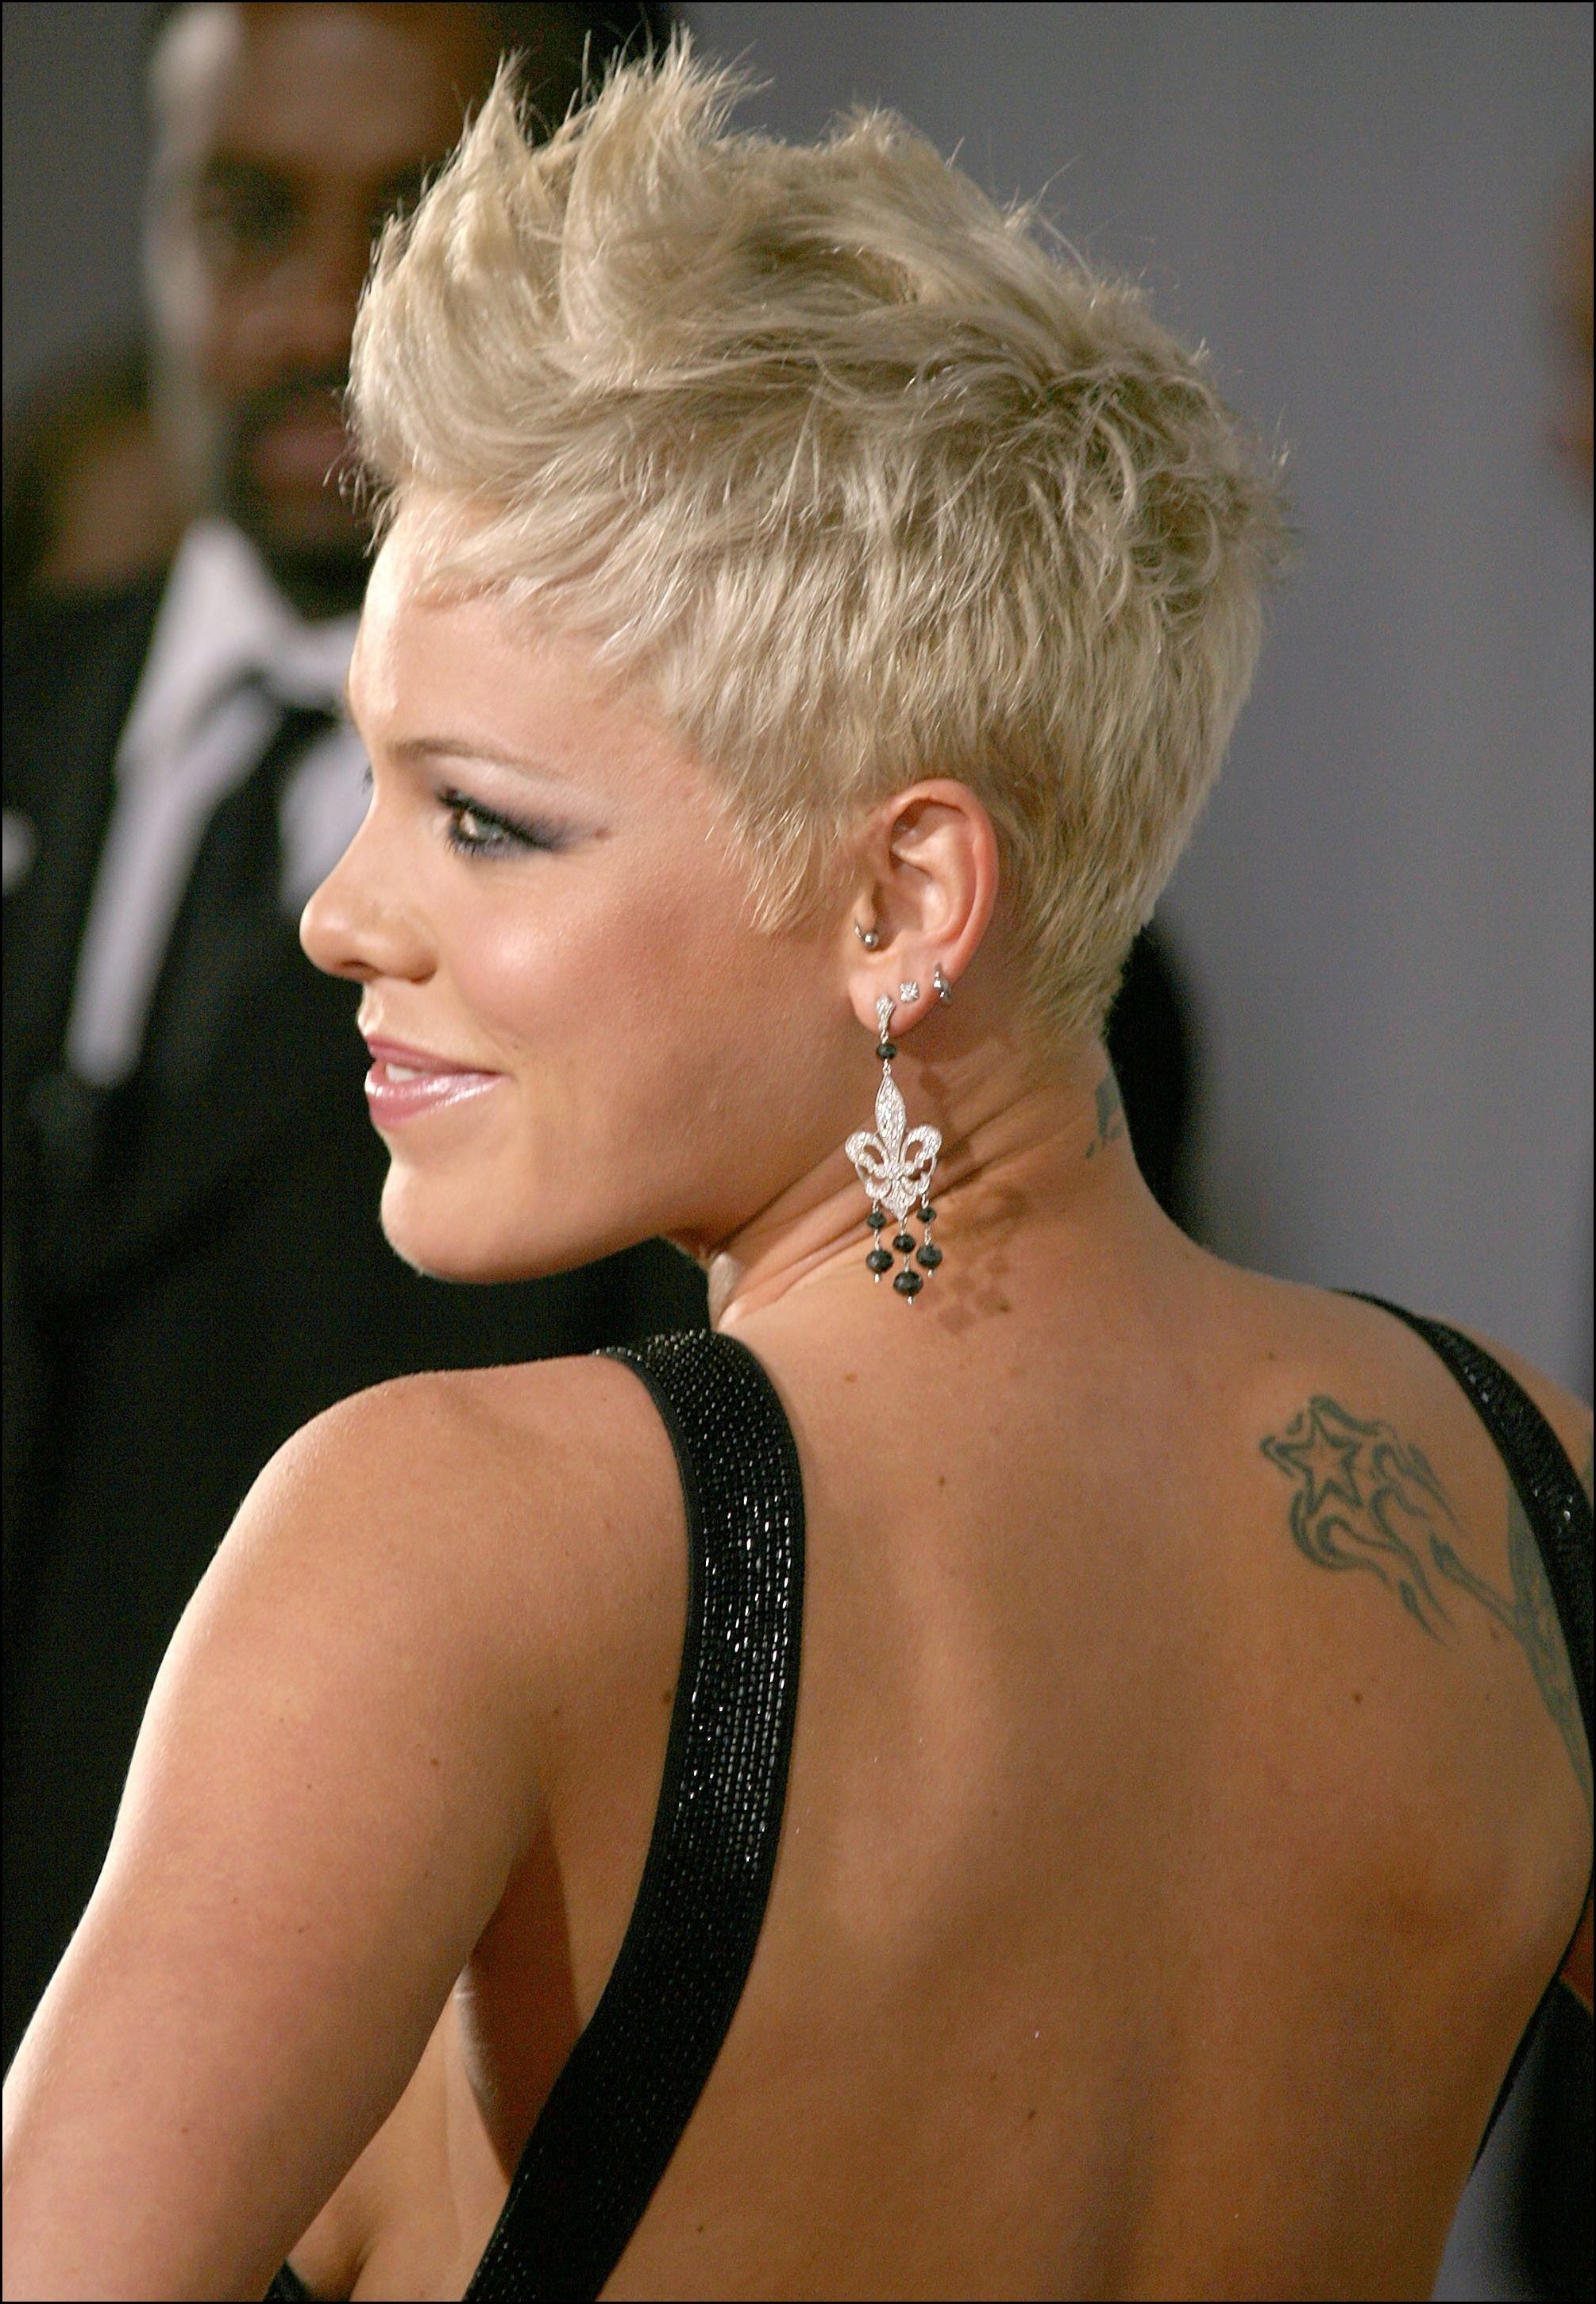 Frisuren pinterest kurz